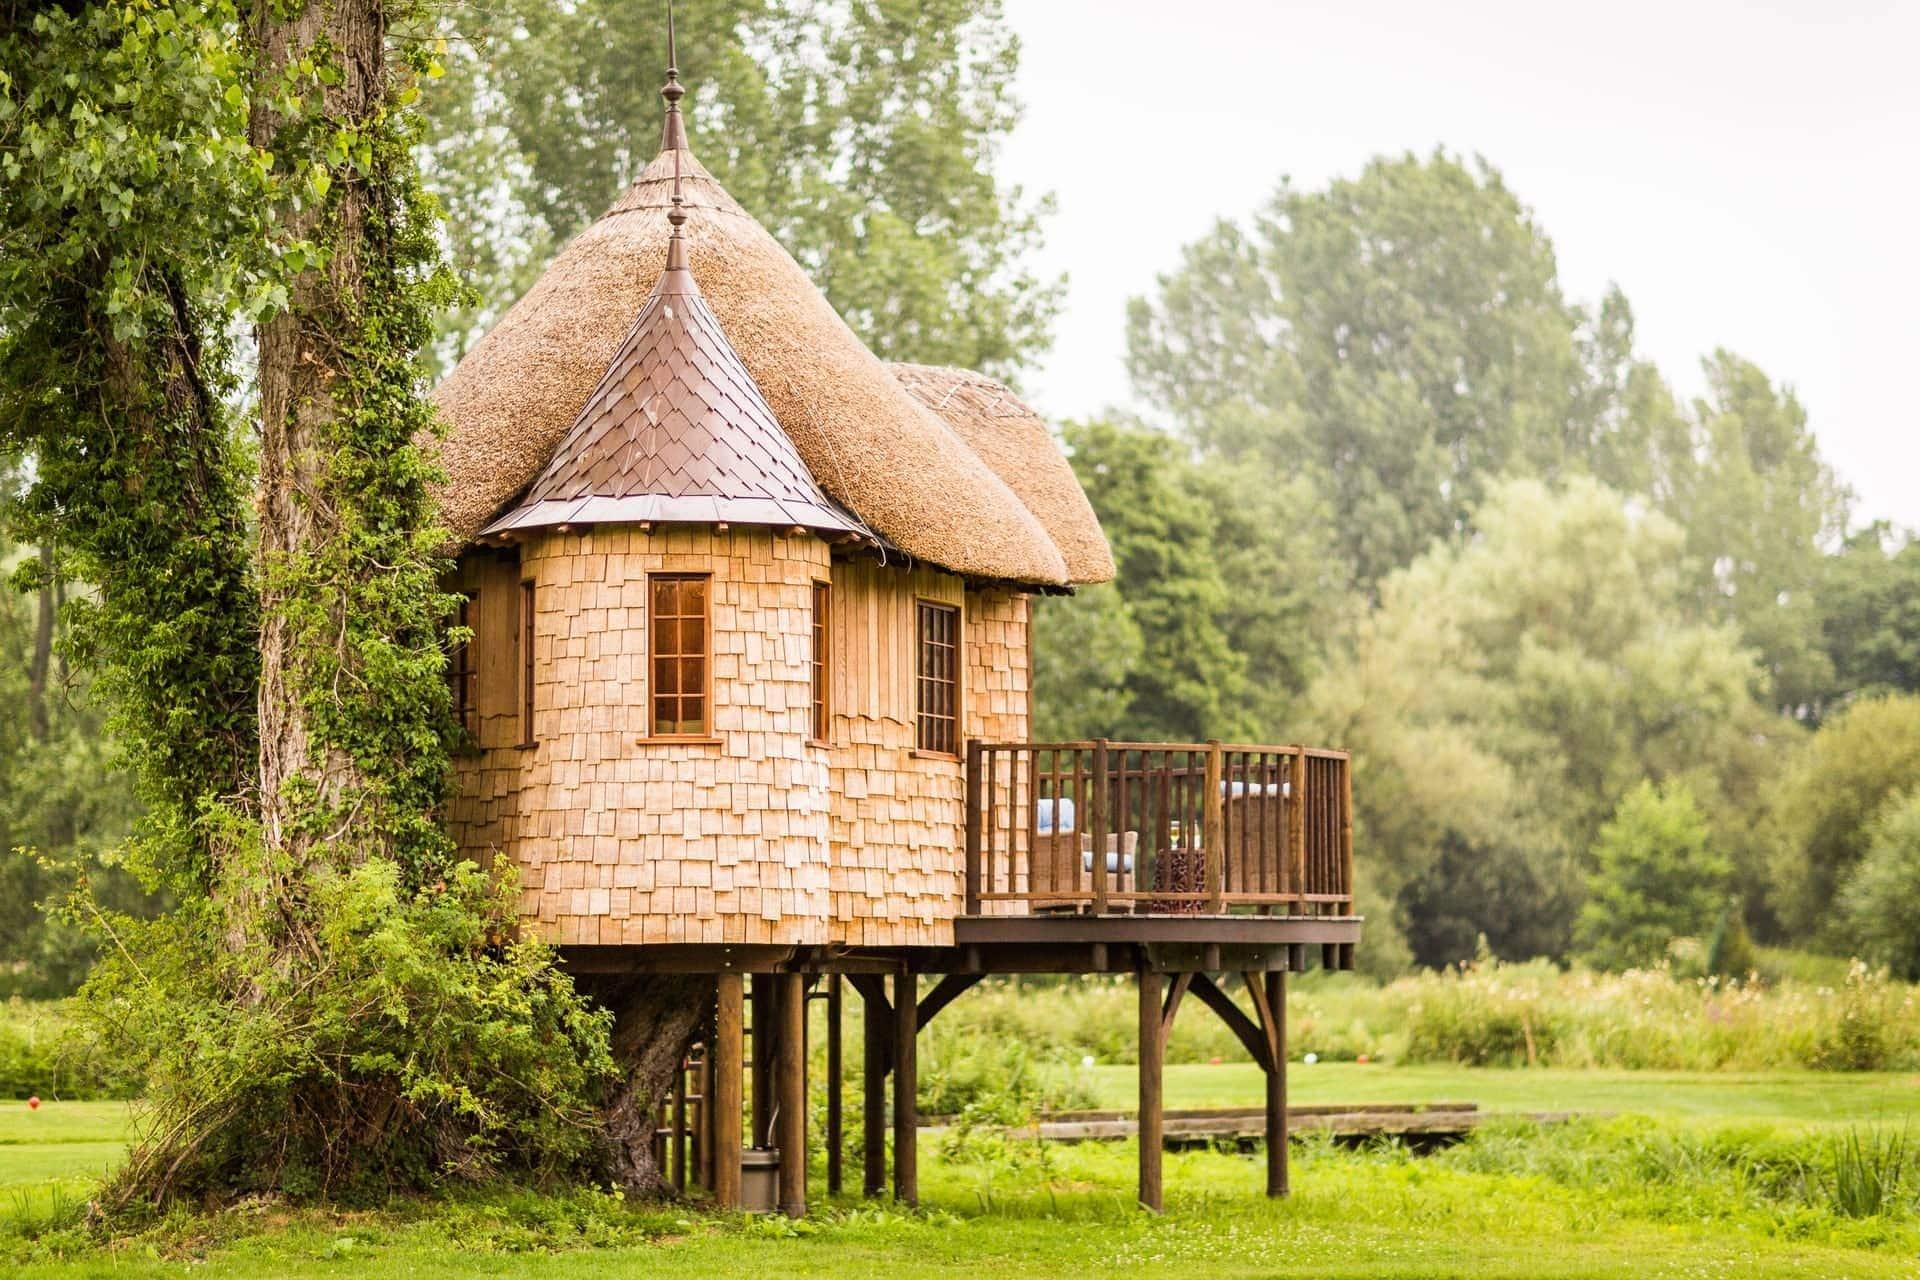 image of a house on stilts